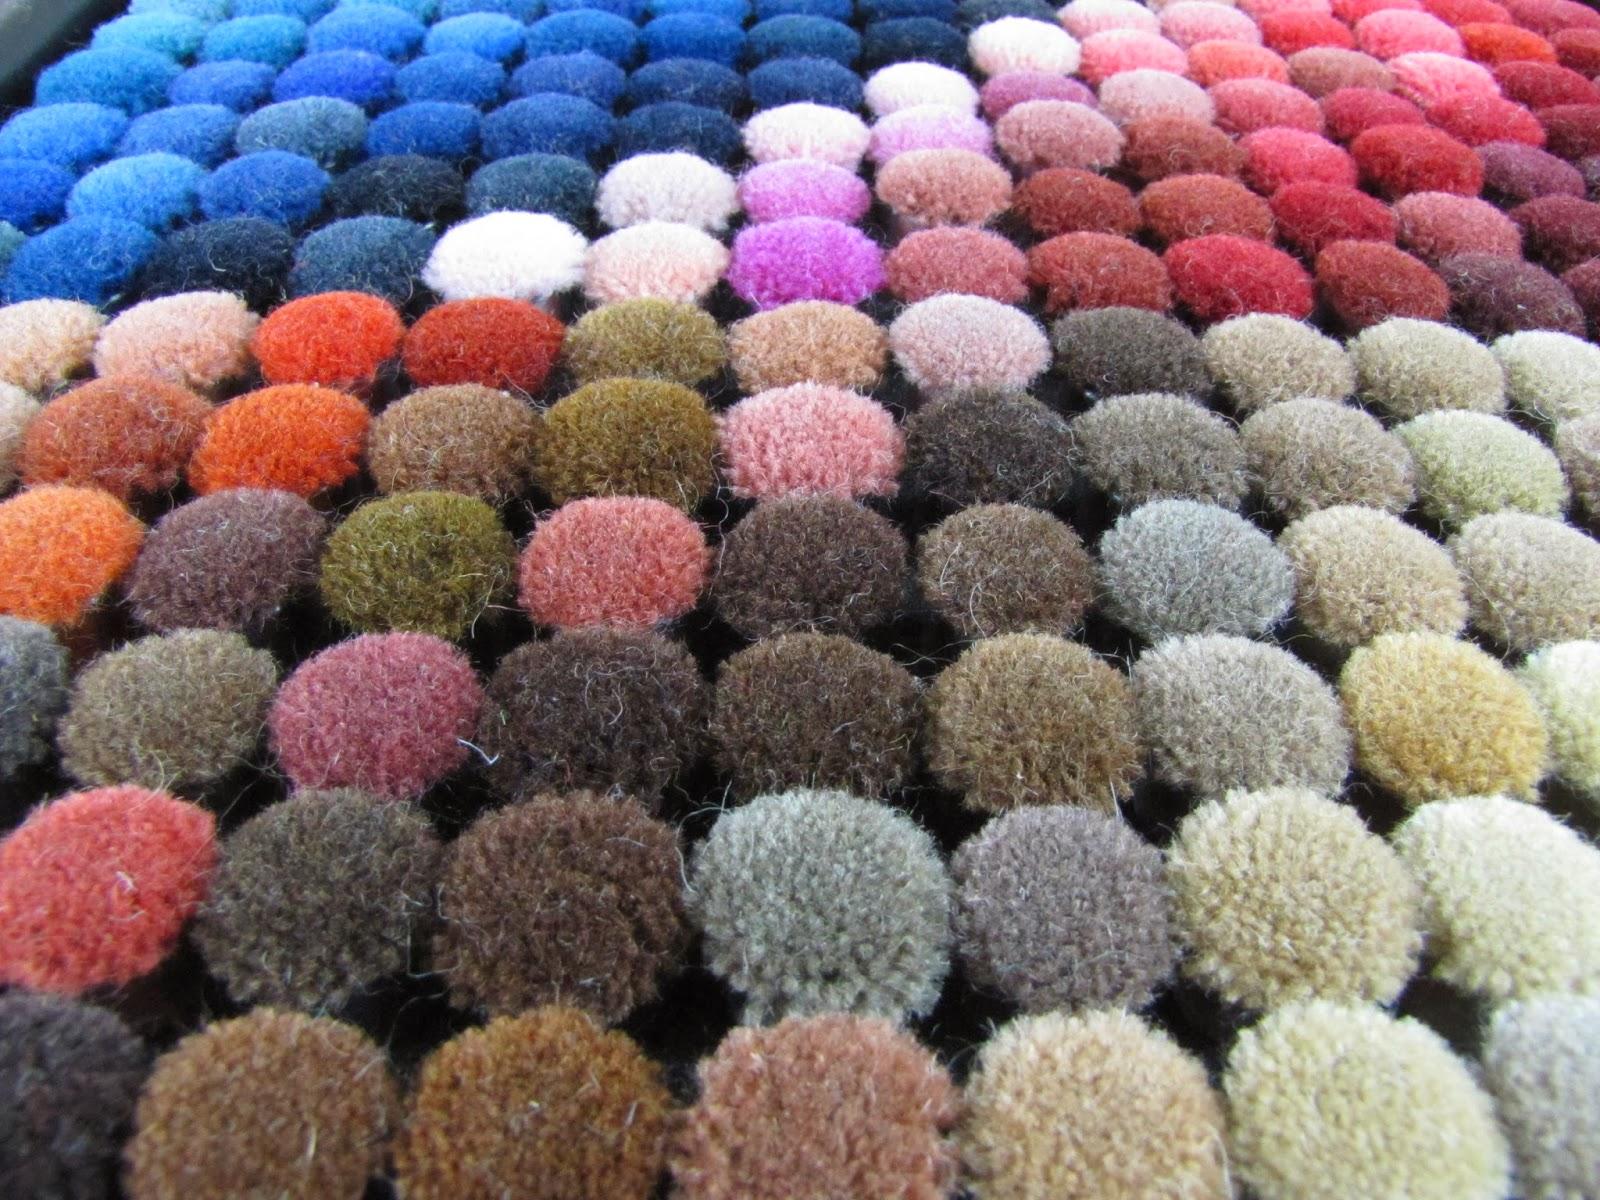 judit gueth creating custom rugs. Black Bedroom Furniture Sets. Home Design Ideas